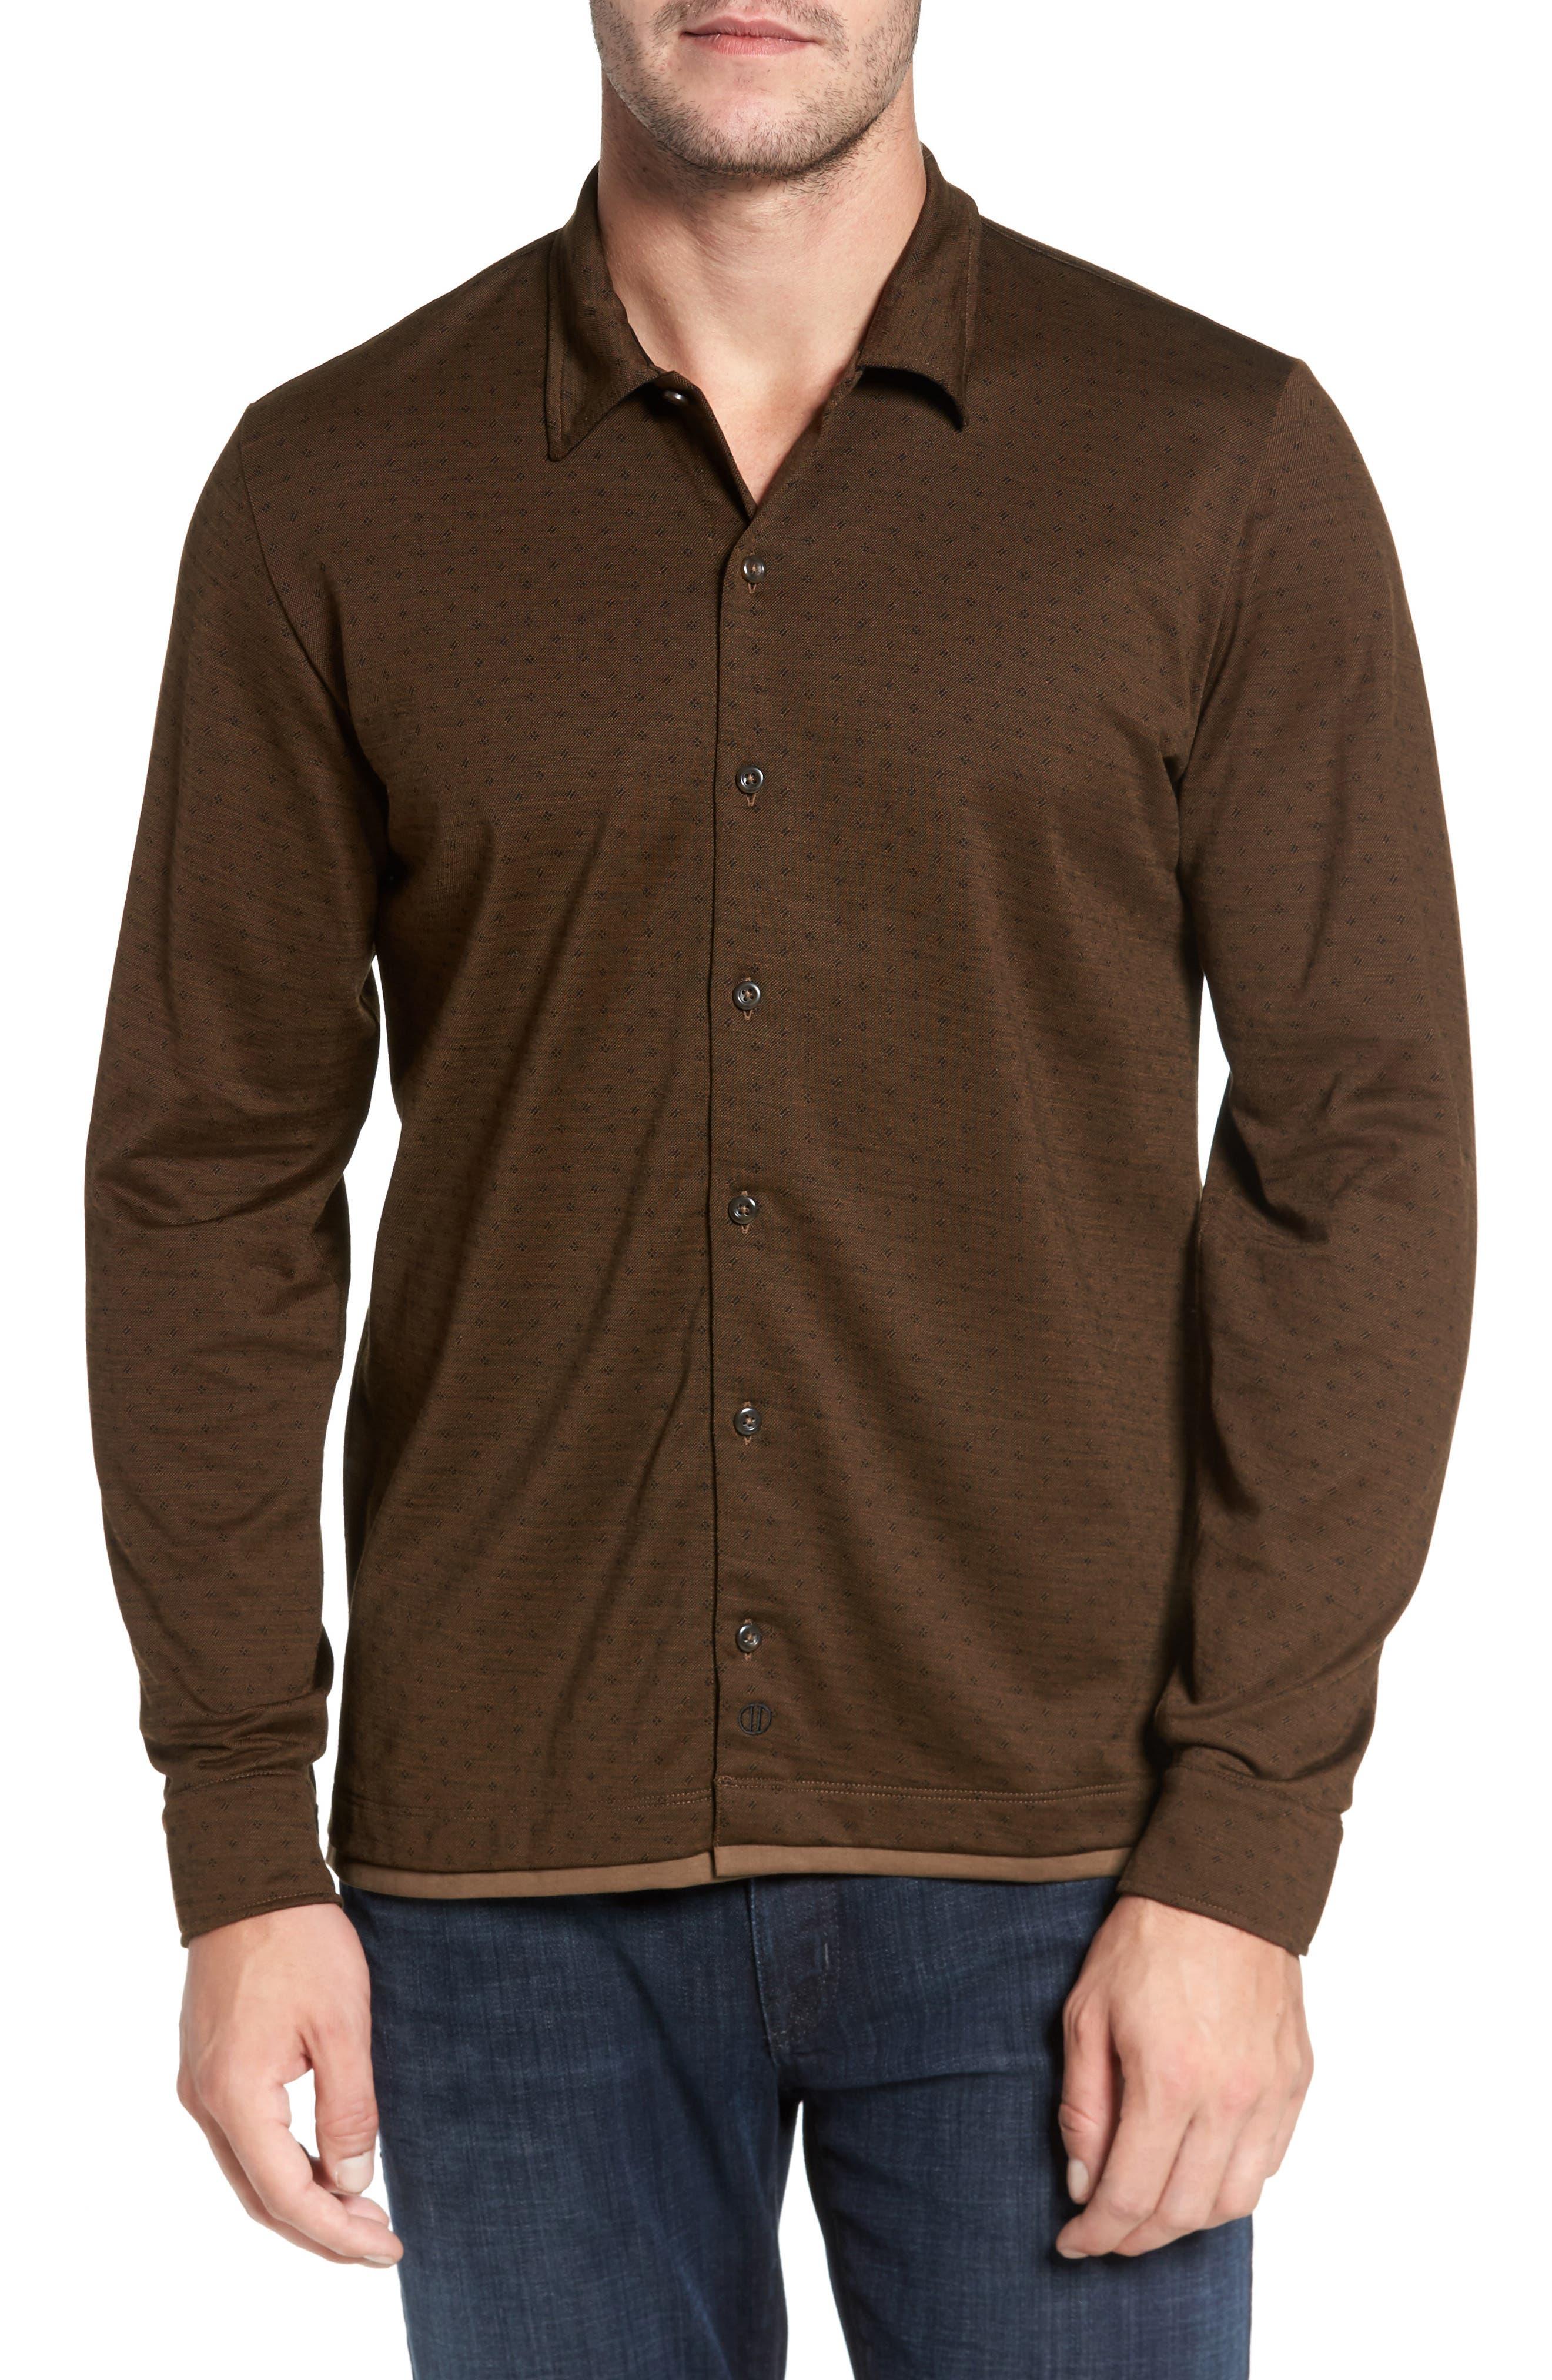 Main Image - David Donahue Jacquard Knit Sport Shirt